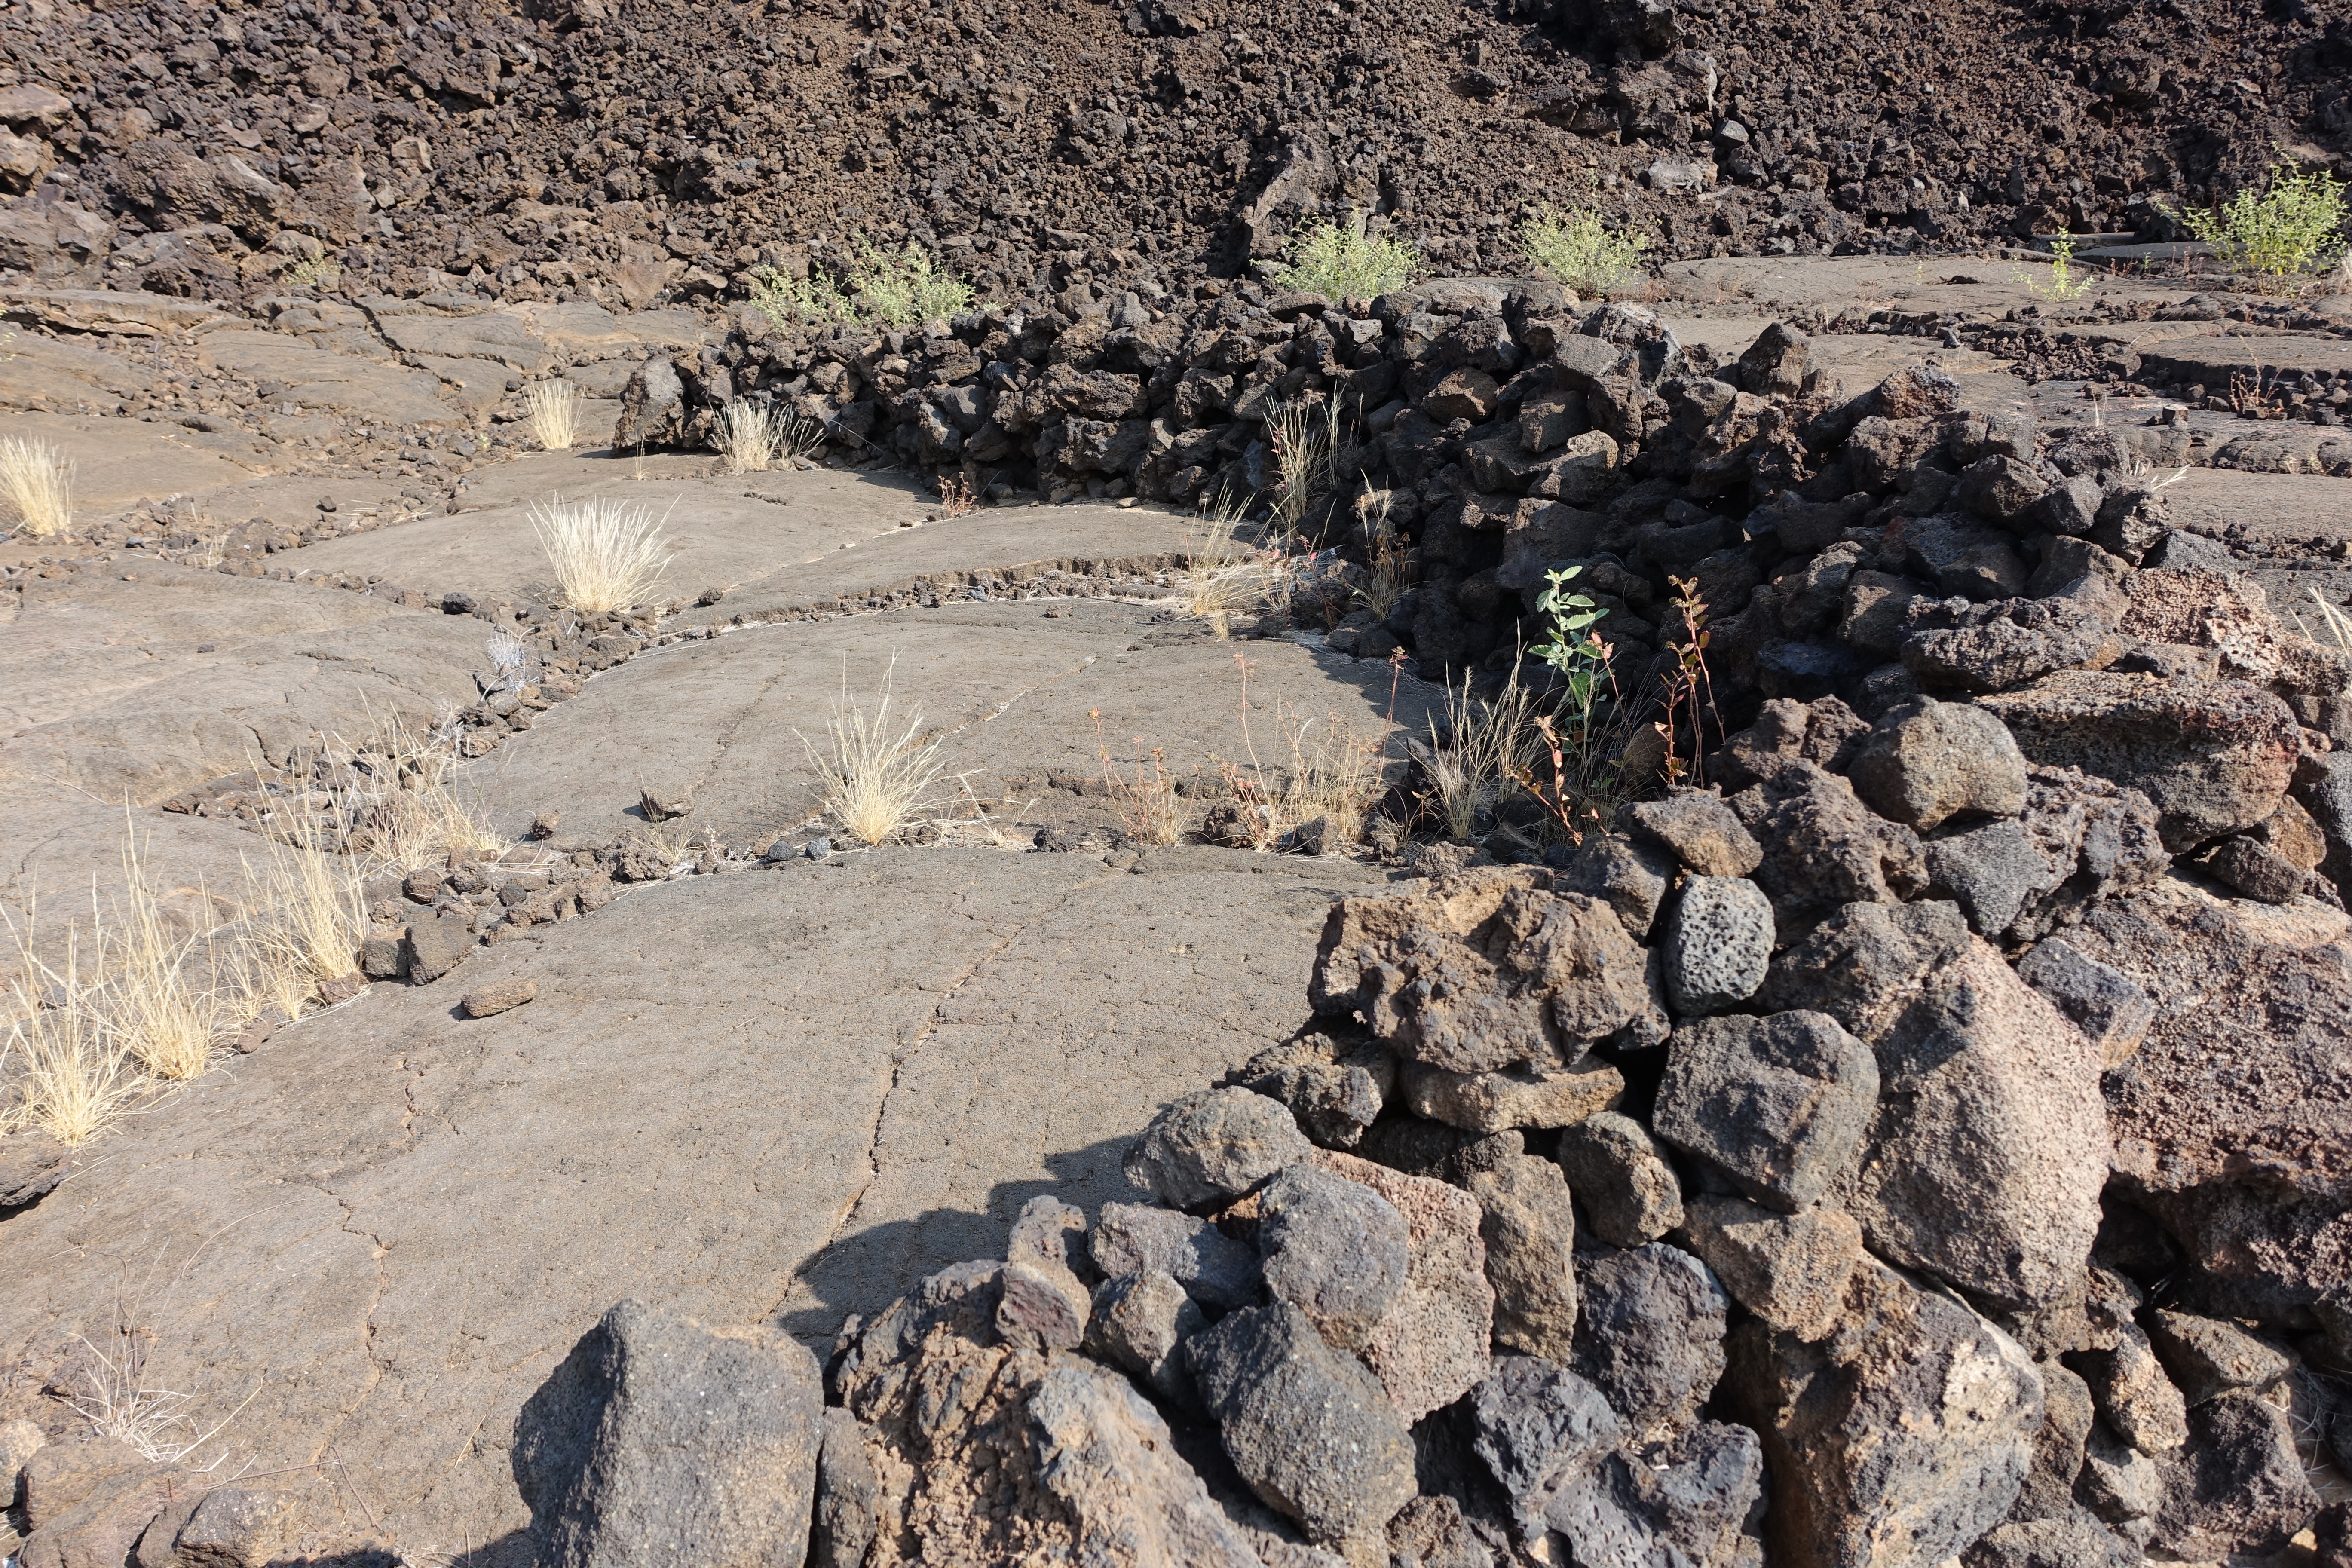 C-shaped rock shelter at Petroglyph Field